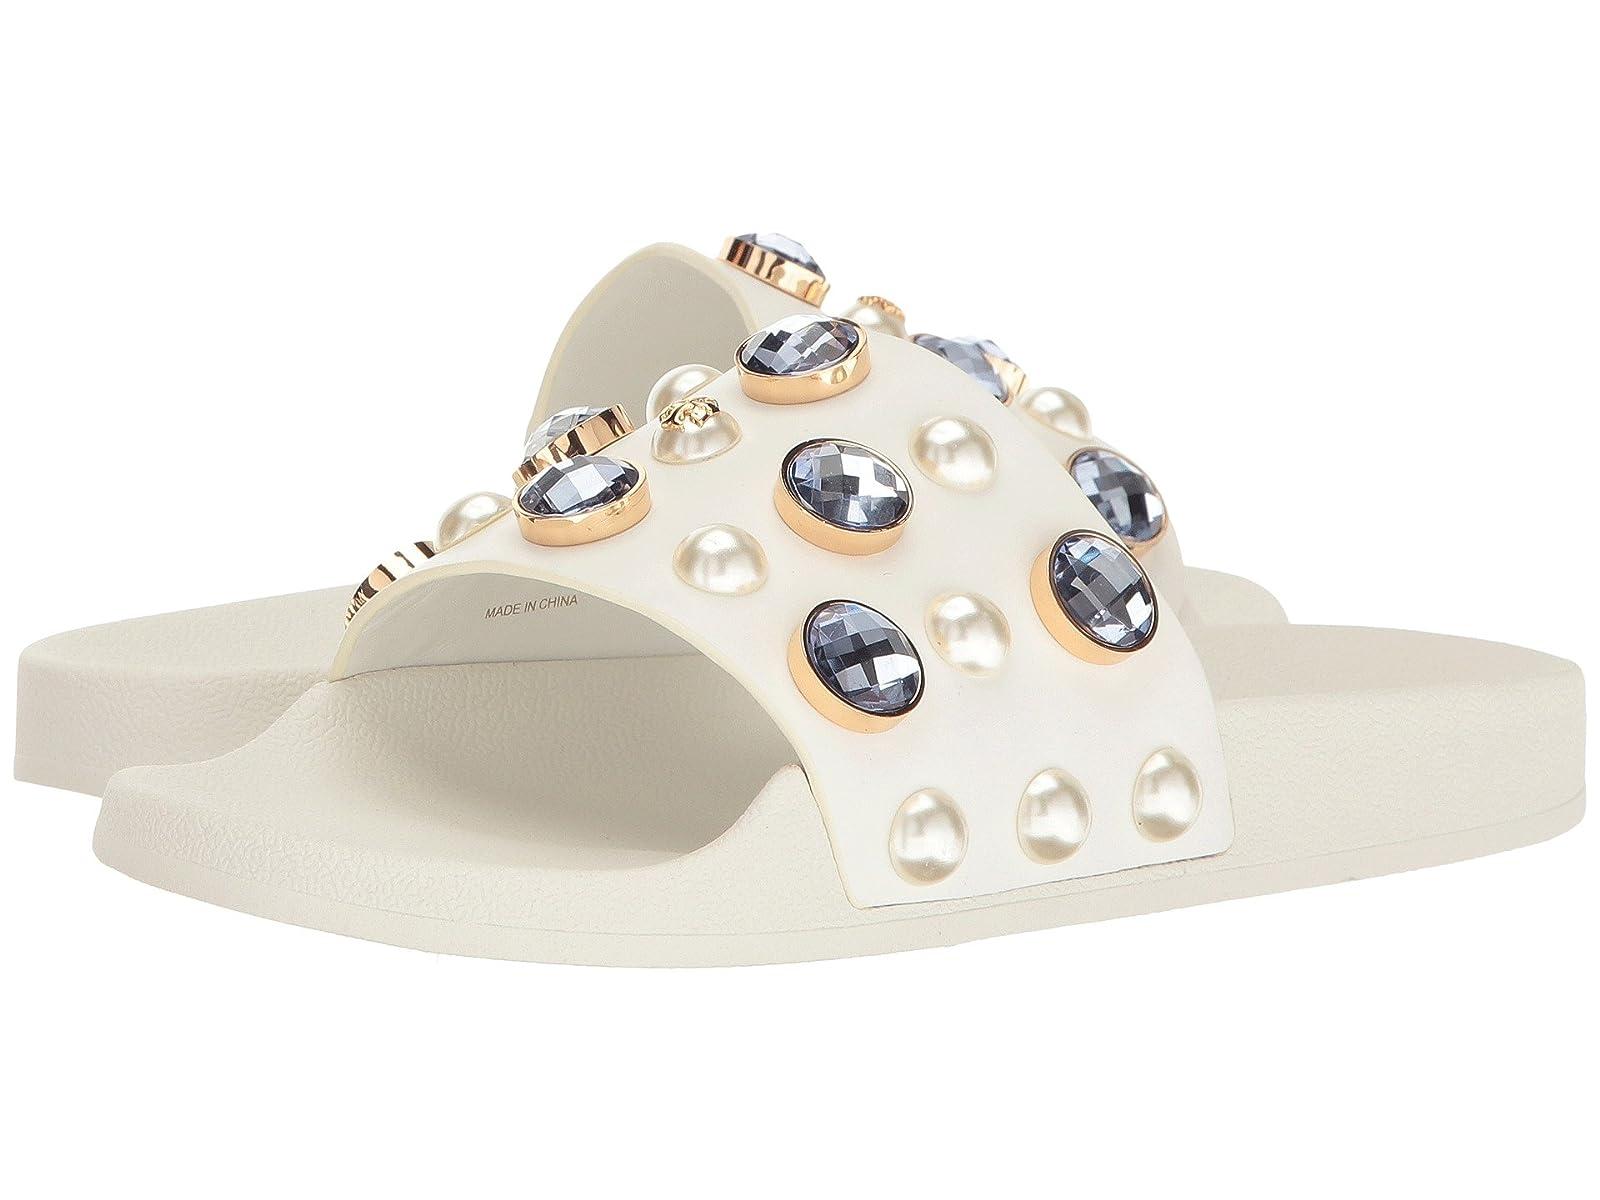 Tory Burch Vail SlideCheap and distinctive eye-catching shoes